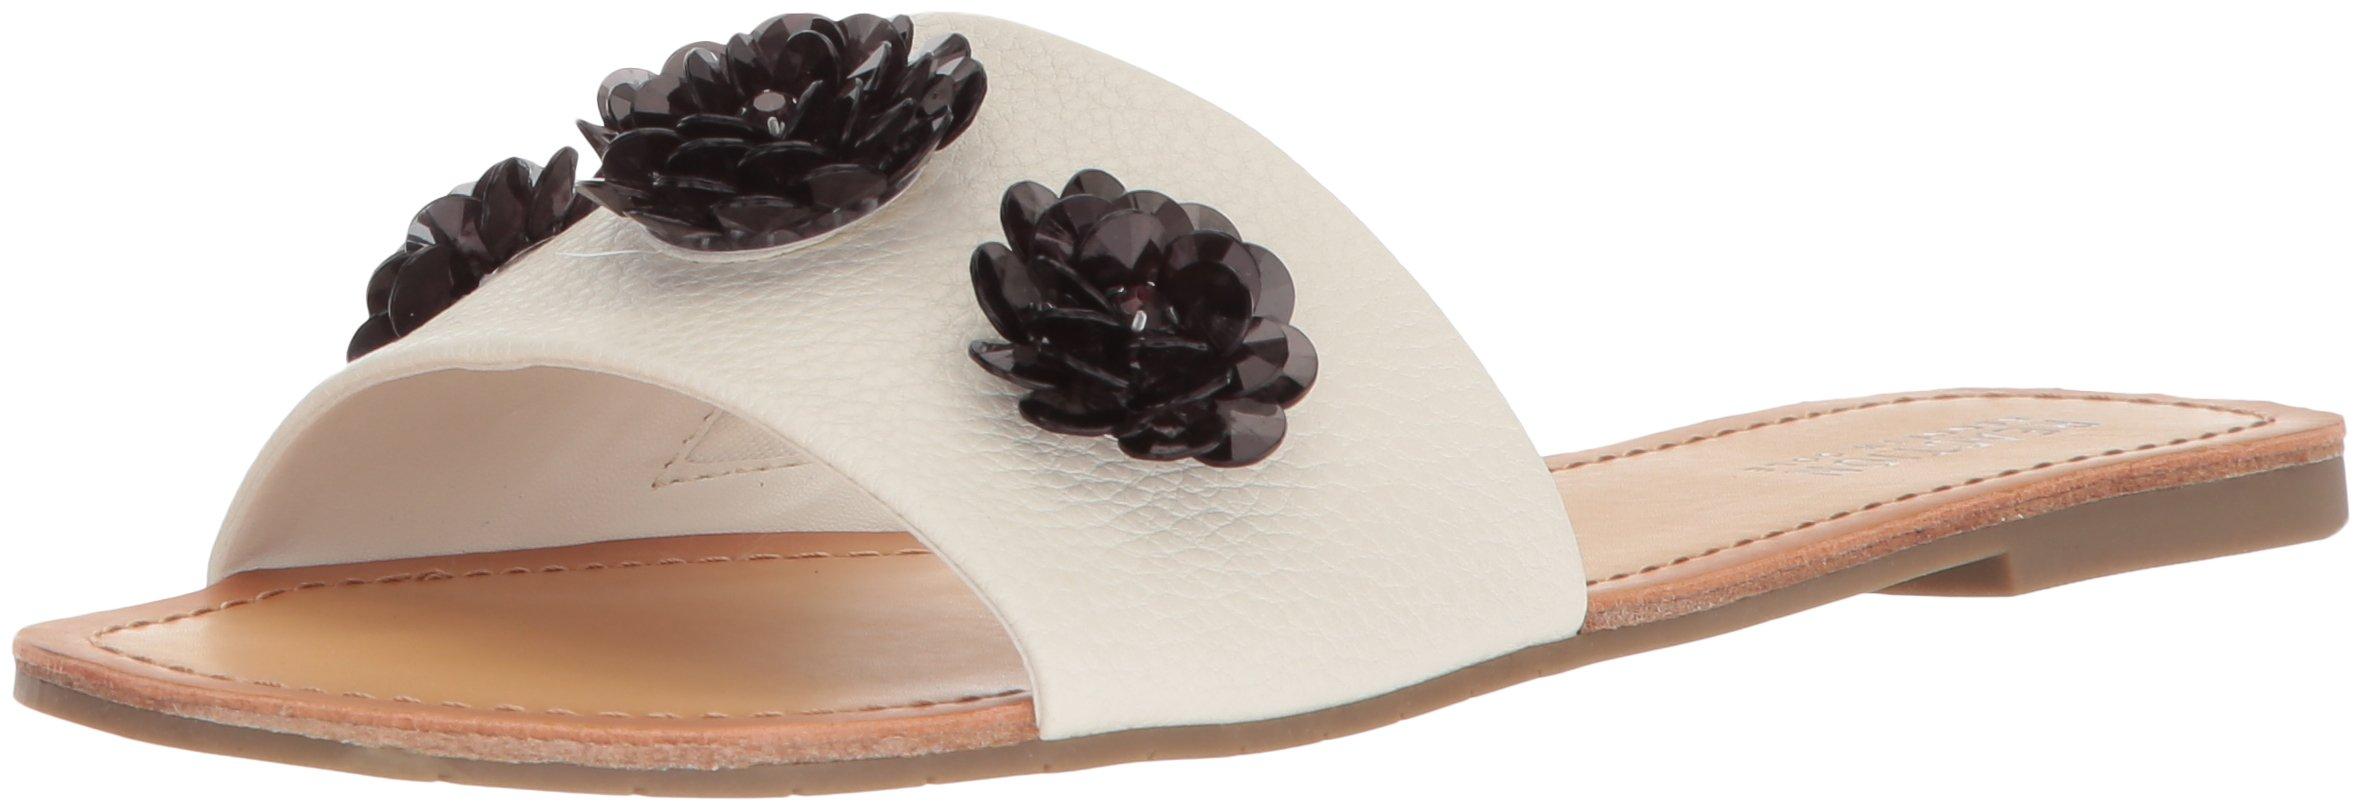 Kenneth Cole REACTION Women's Just Enough Slip on Slide Flower Gems Flat Sandal, Stone, 8.5 M US